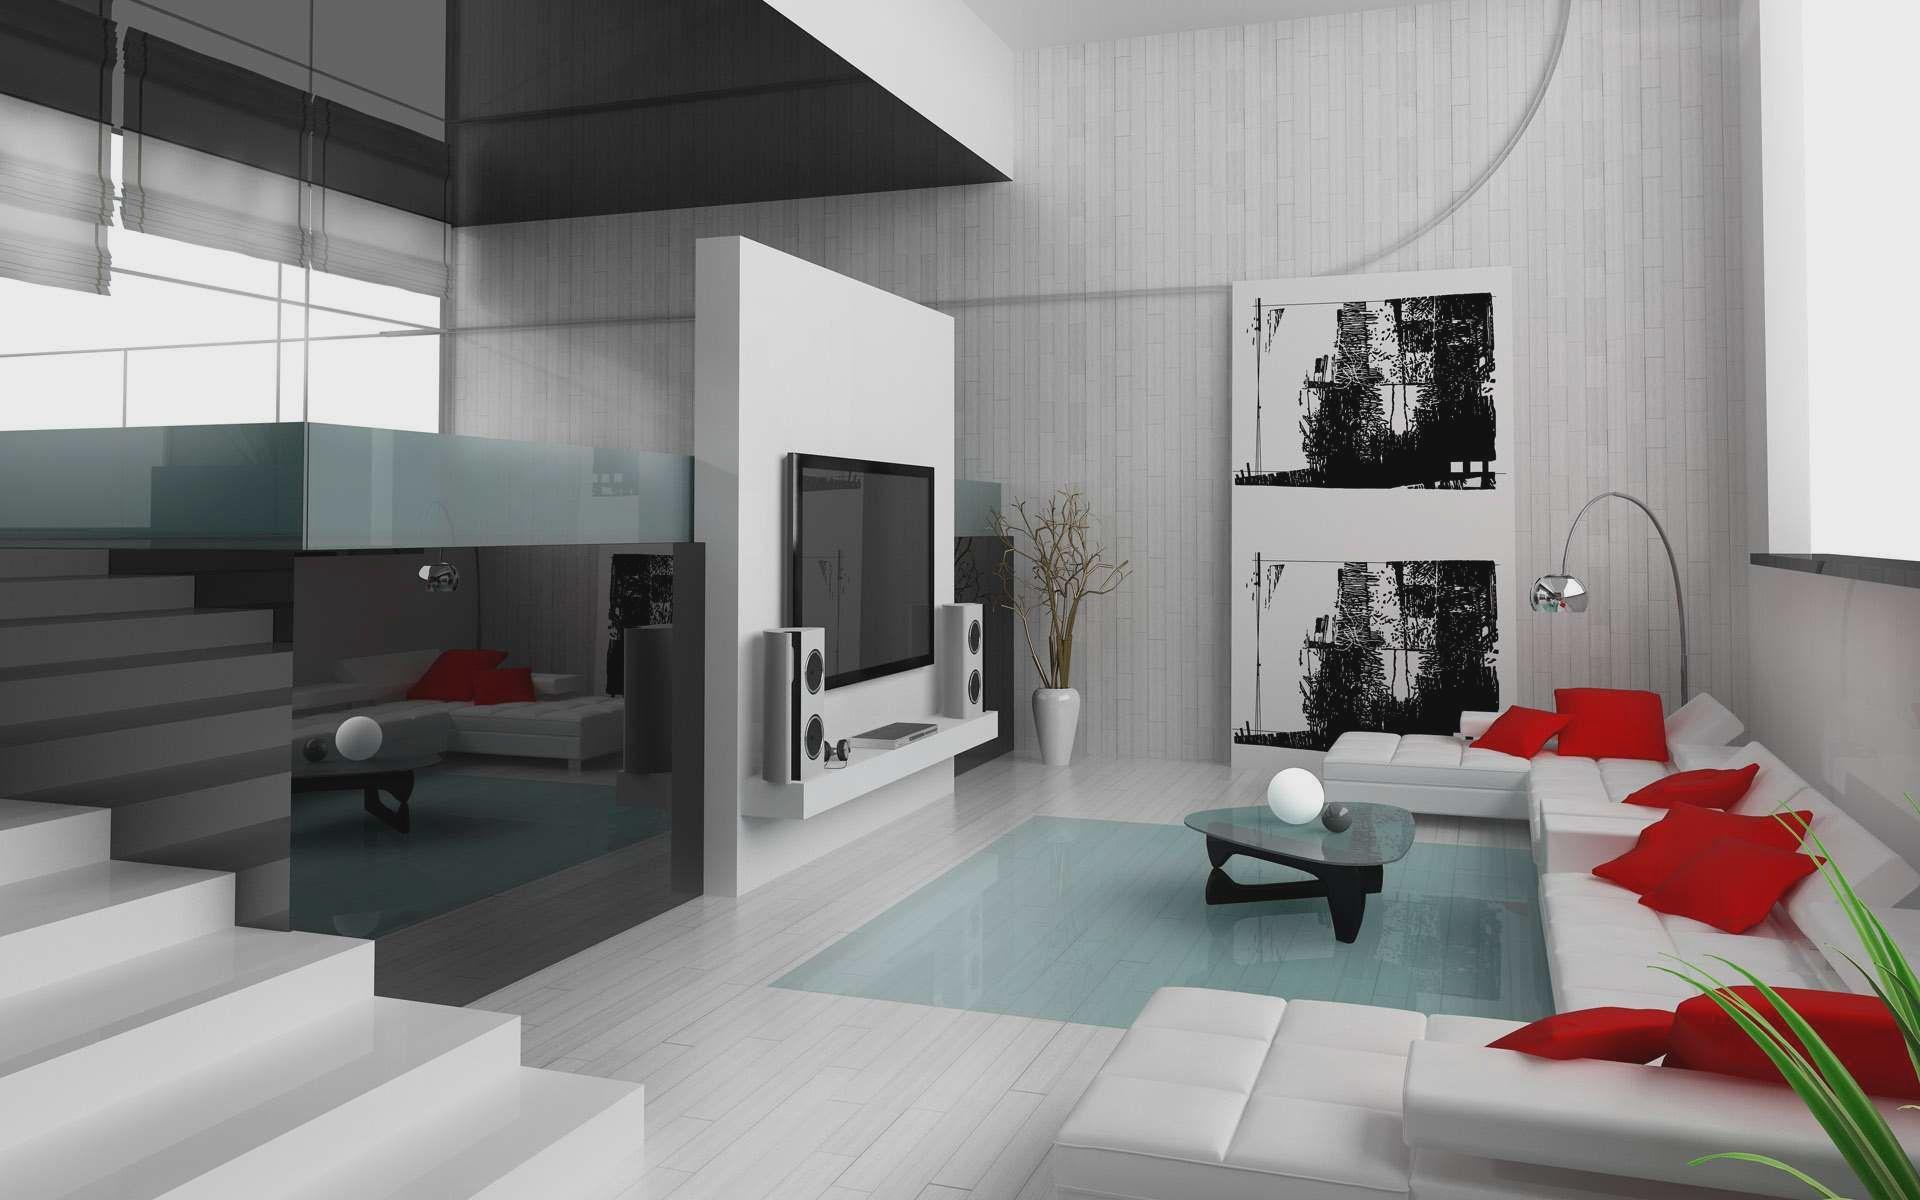 Modern Home Interior Design Images Modern Home Interior Design Images Downl Minimalist Living Room Design Modern